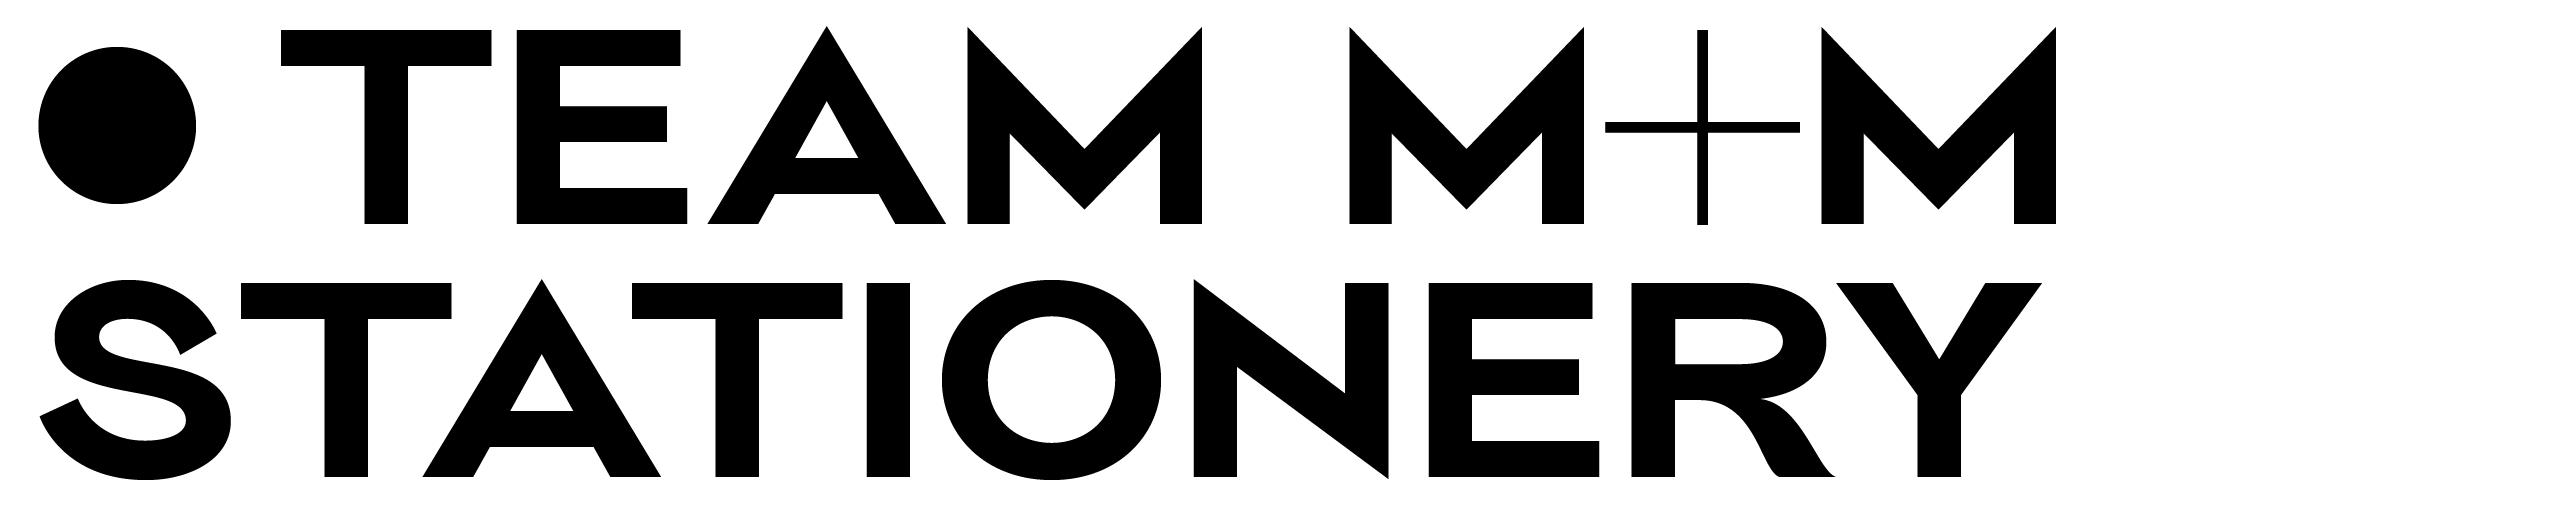 Stationery for team m&m —— foil stamp —— colour edge